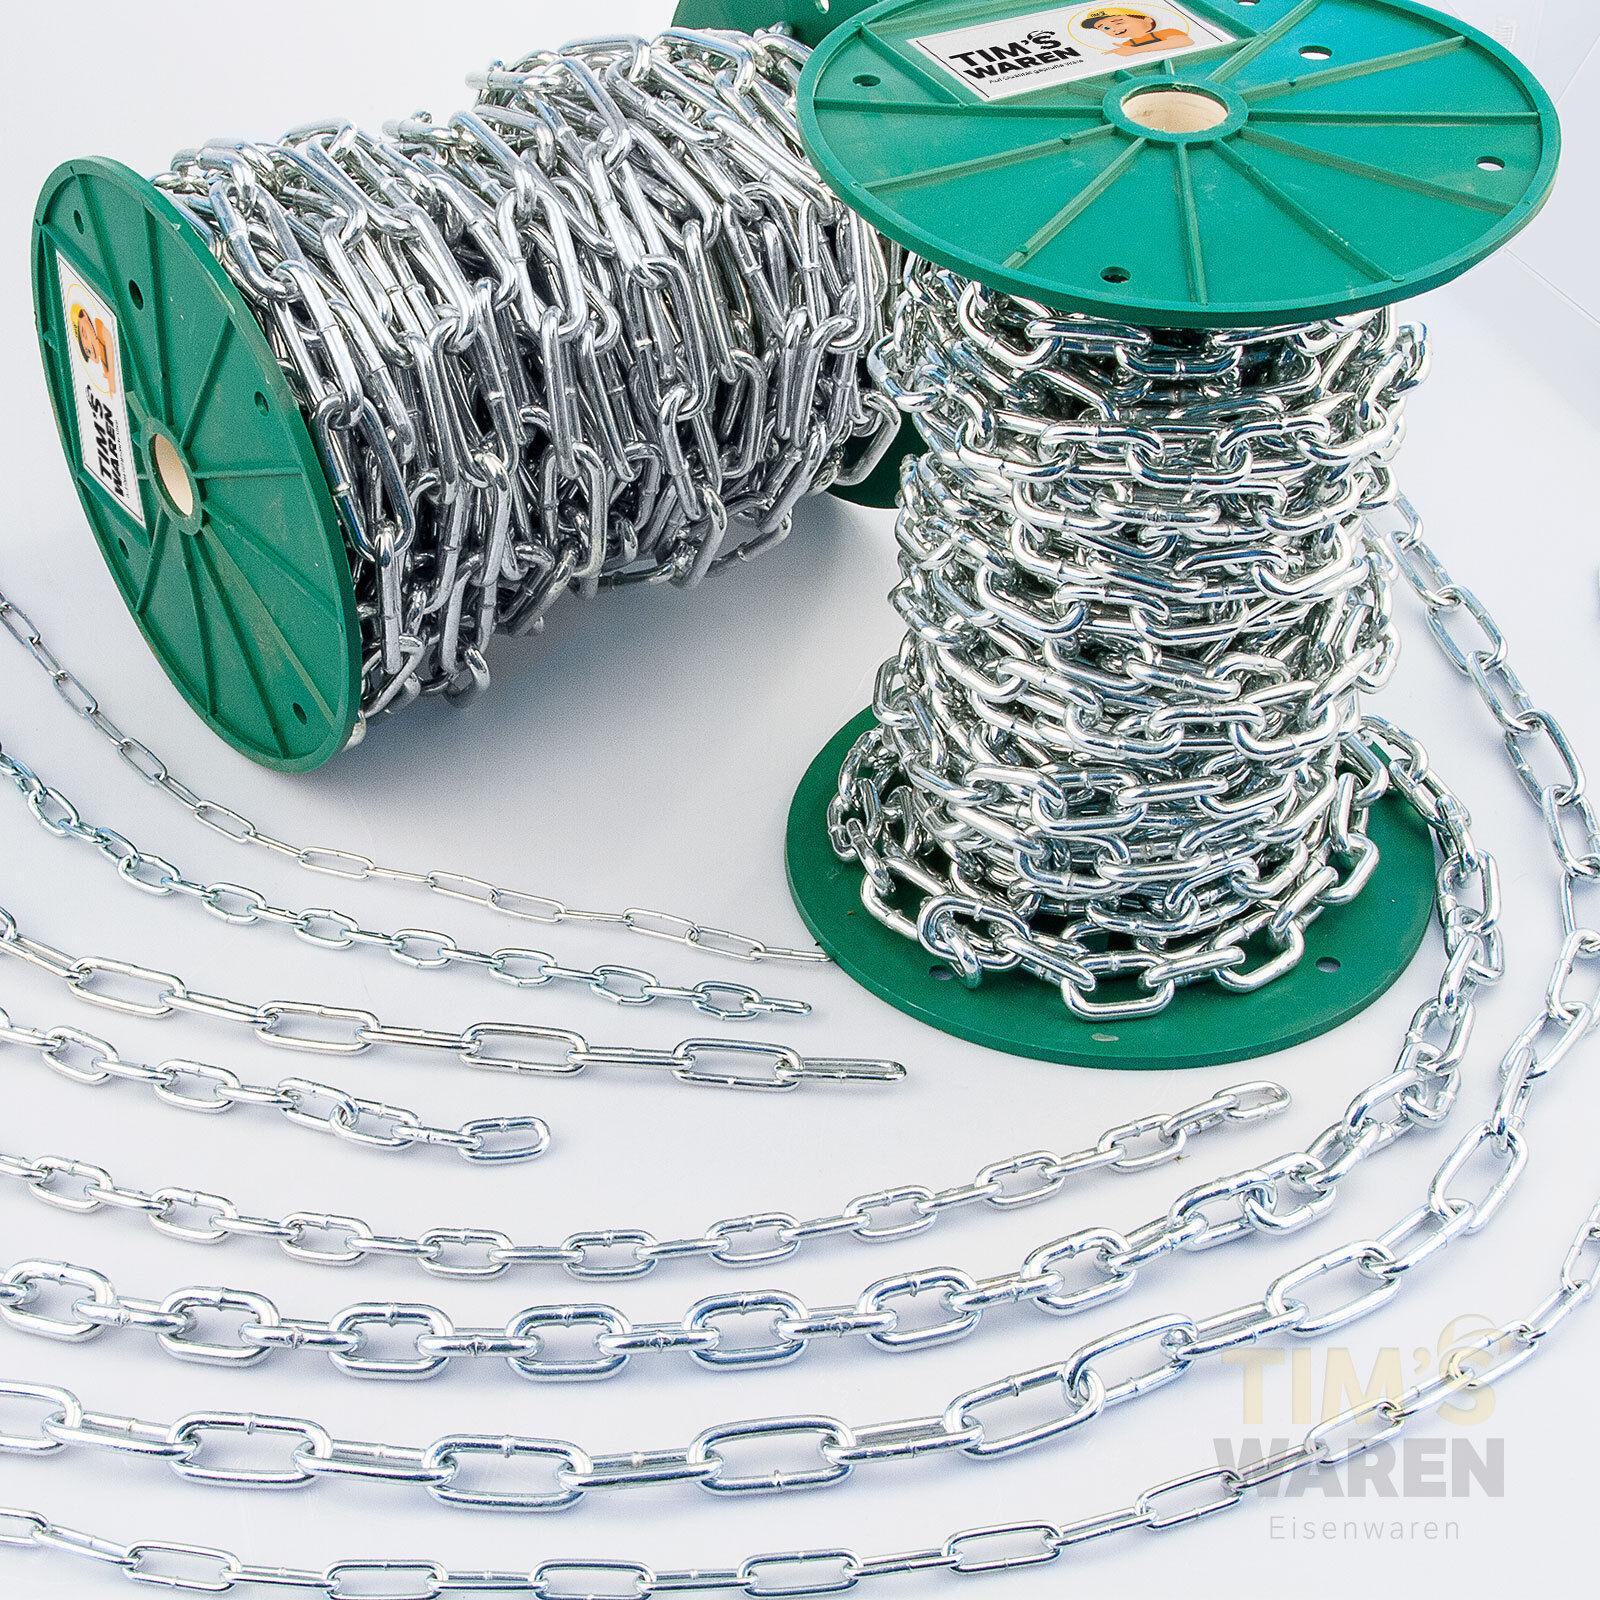 Stahlkette verzinkt Rundstahlkette Eisenkette kurzgliedrig & langgliedrig TLK